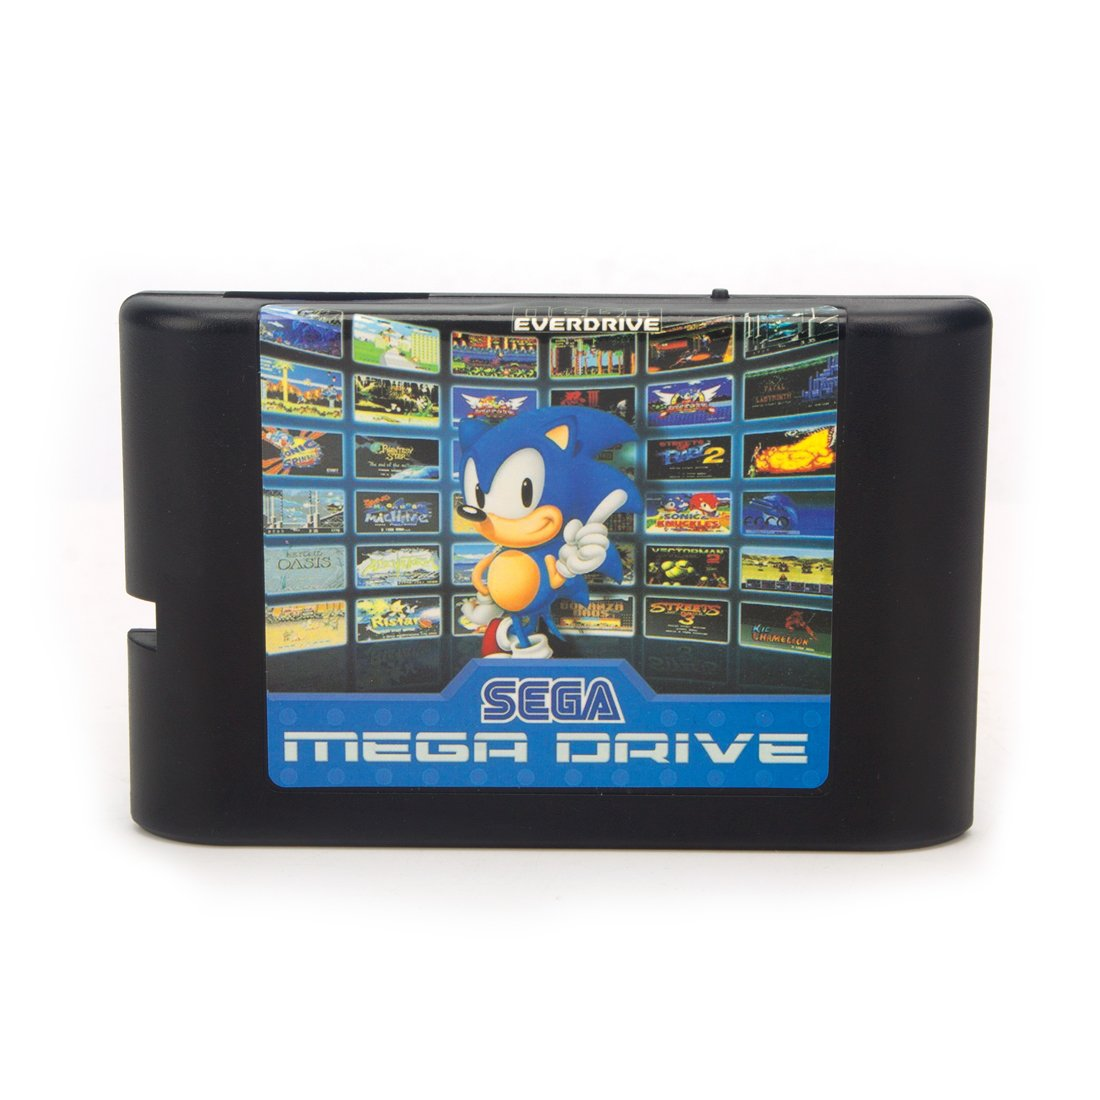 820 in 1 Game Cartridge 16 bit Game Card for Sega Mega Drive Genesis Console